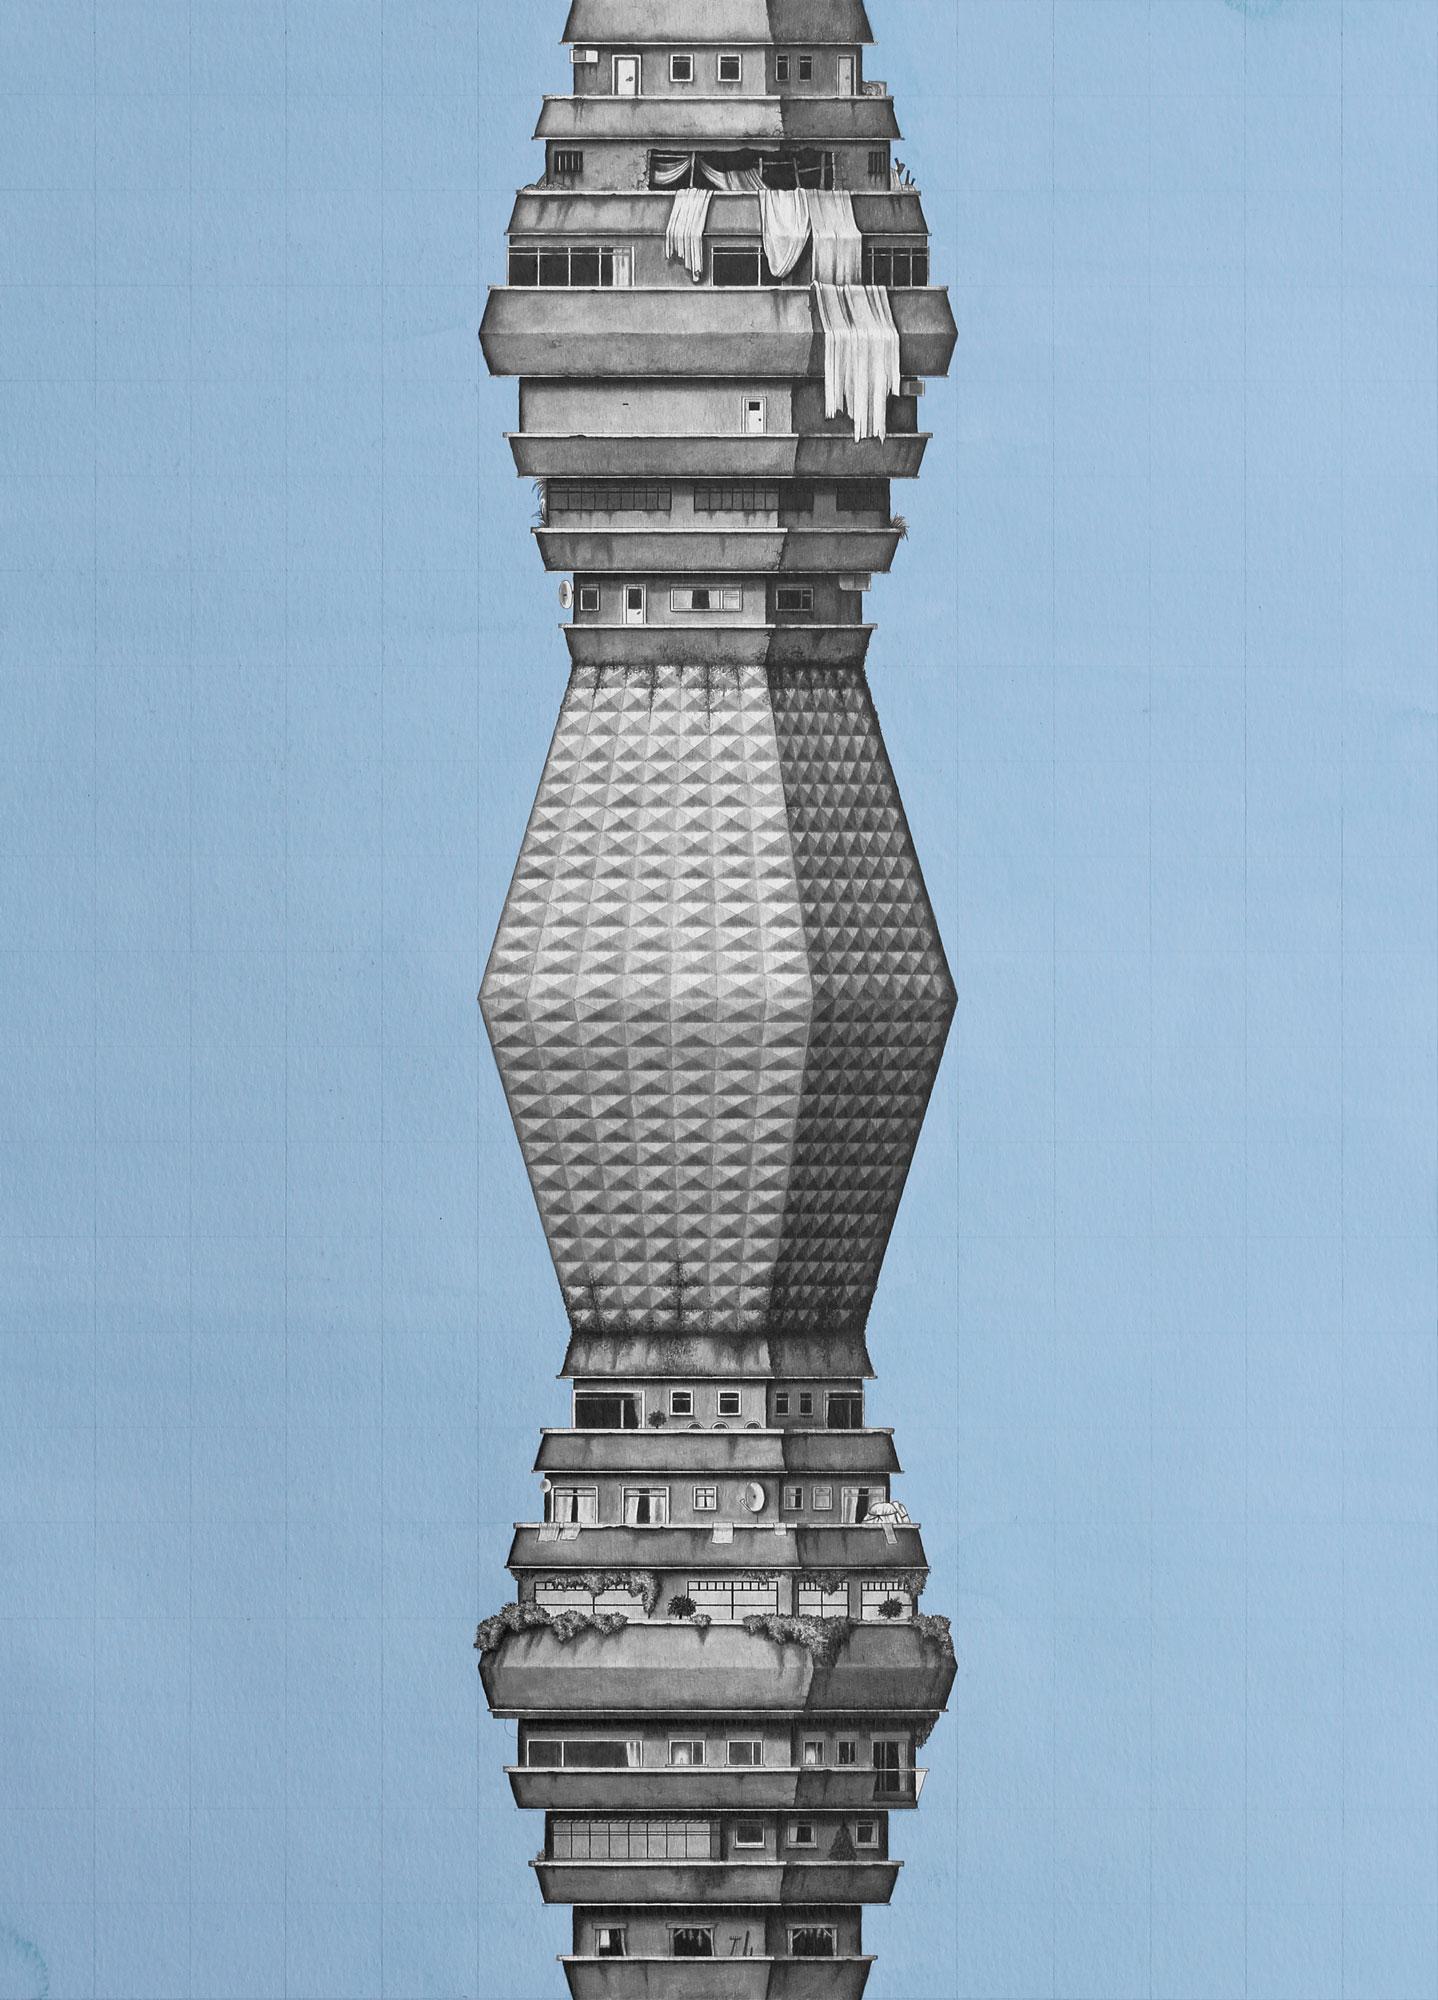 Ba Da Dodă, Water Tower by Chris Agnew